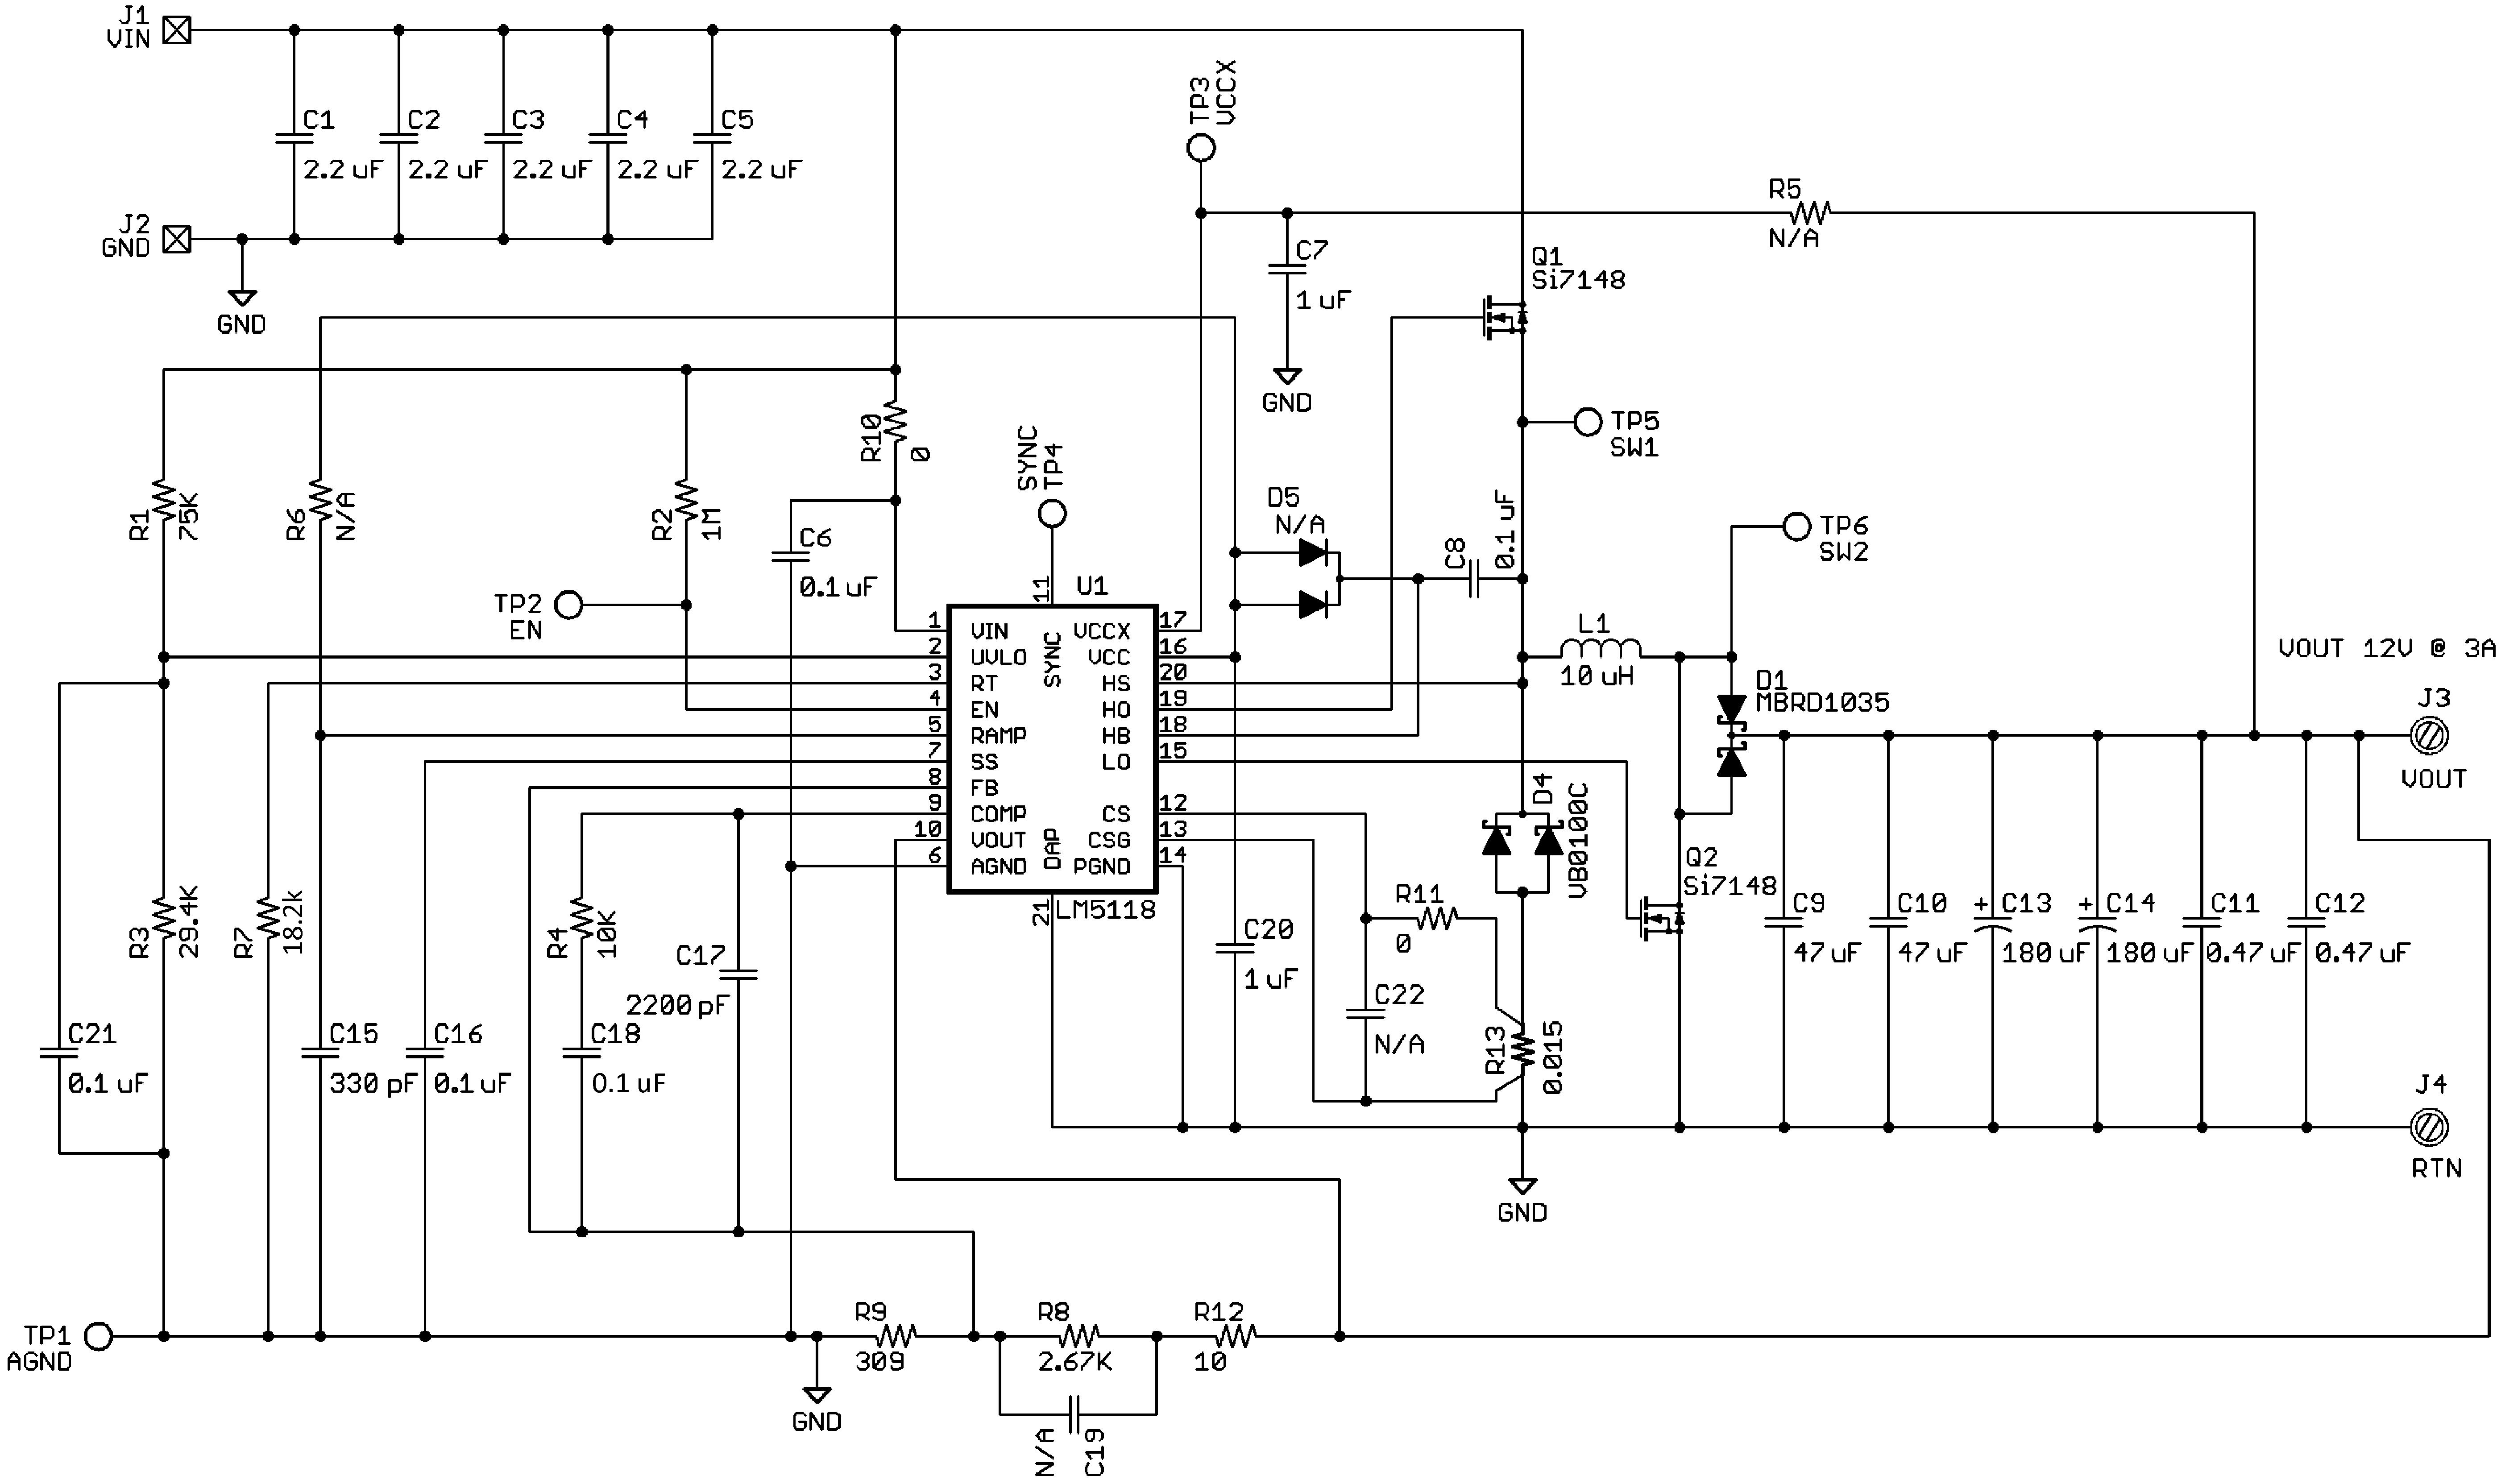 Lm5118 Q1 R13 135 Switch Wiring Diagram 30058553